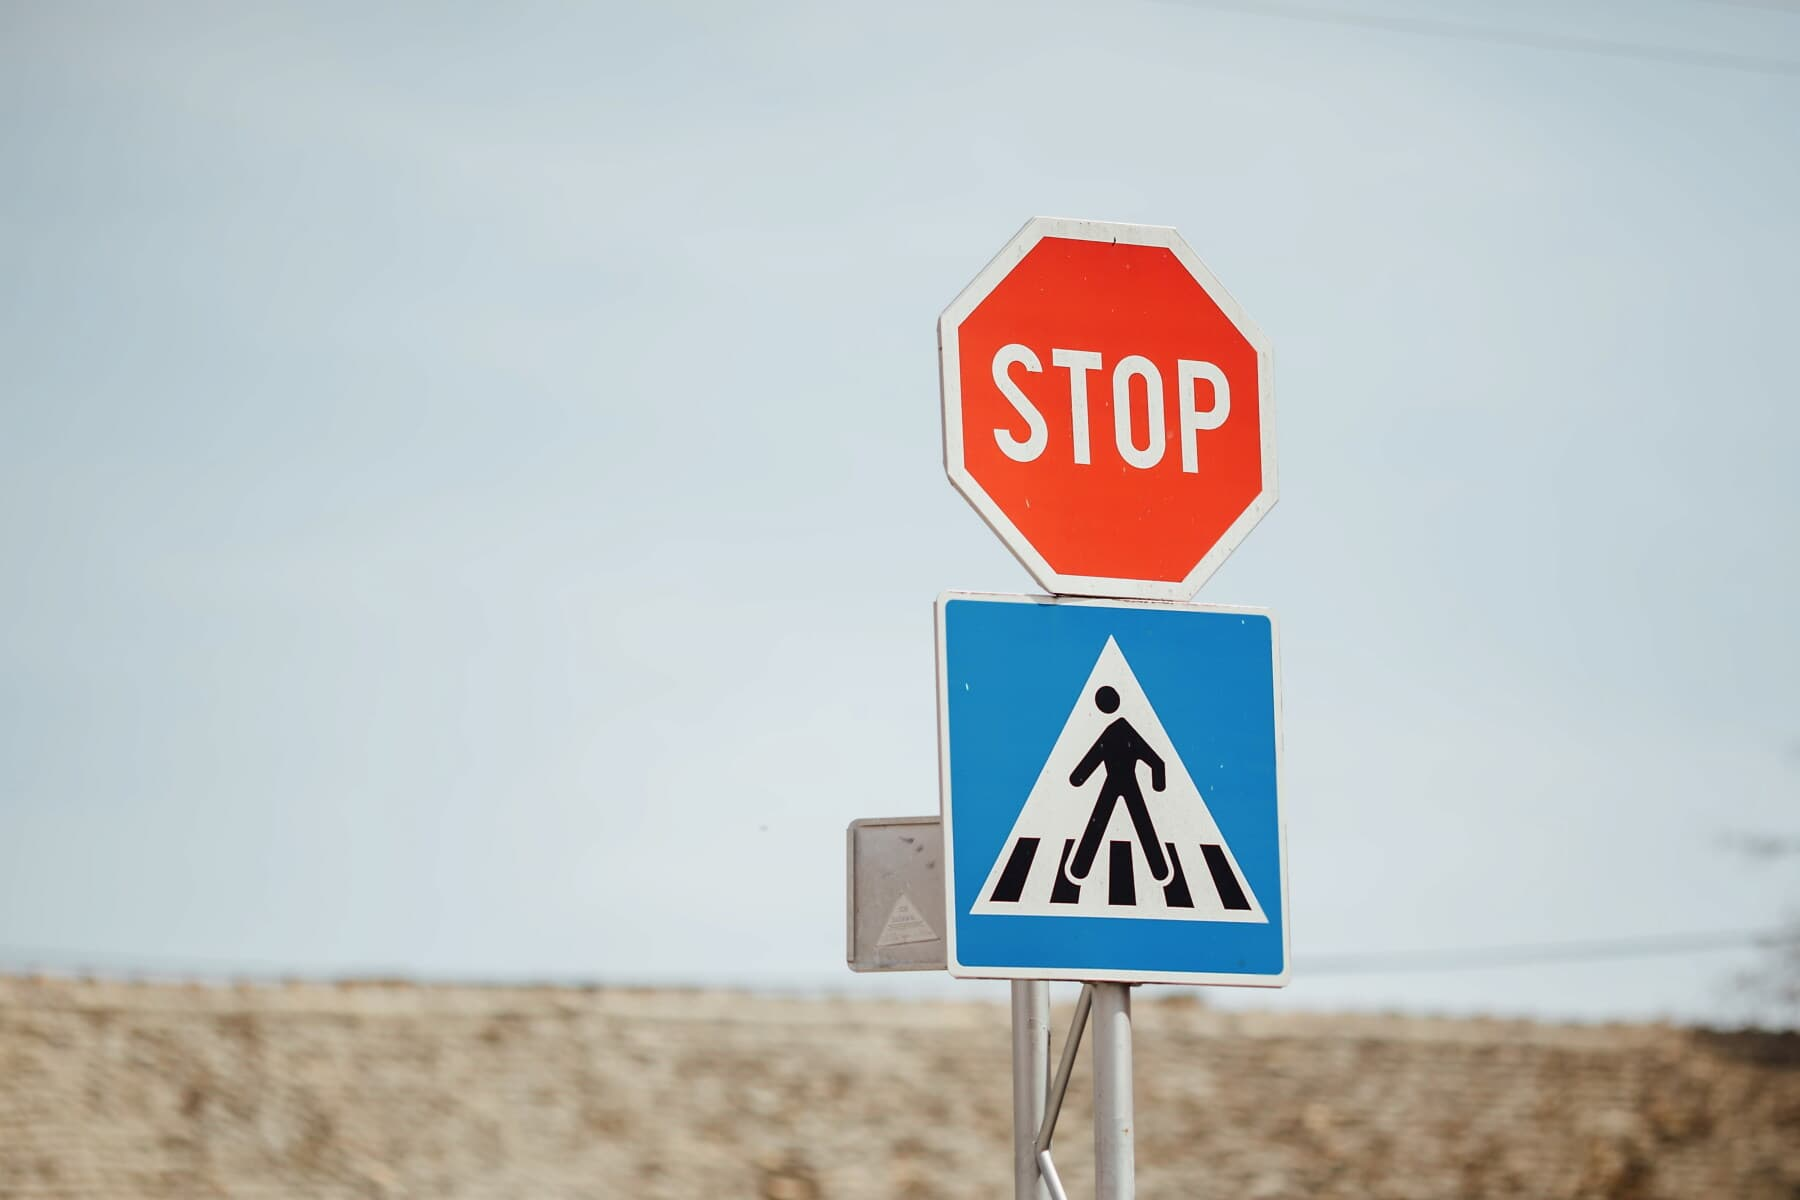 stop, crosswalk, sign, traffic, traffic jam, traffic control, crossroads, crossing over, warning, road